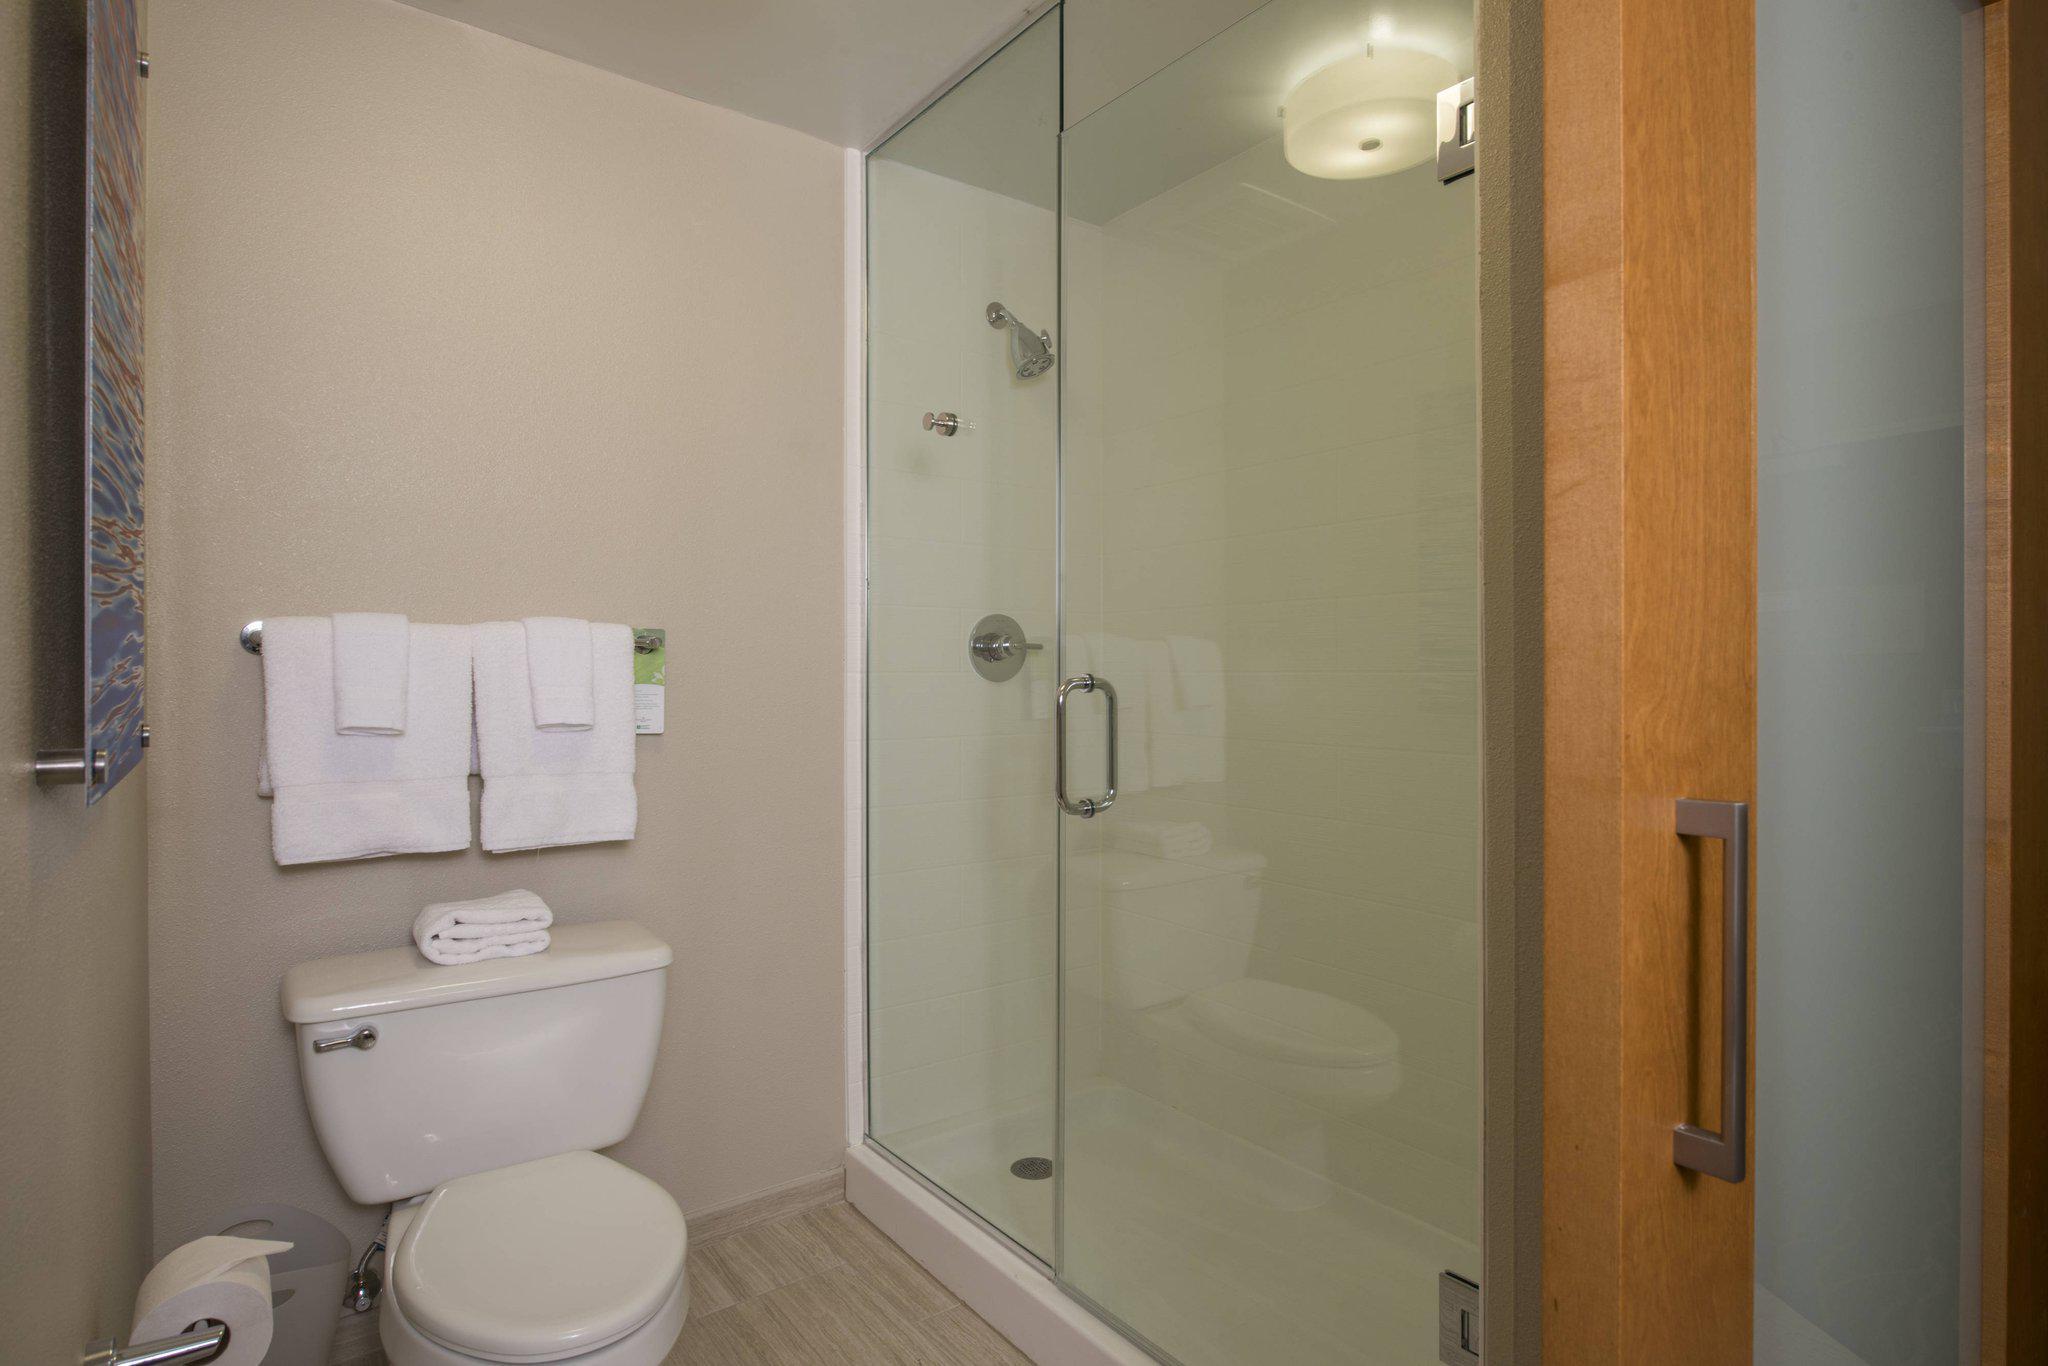 SpringHill Suites by Marriott San Antonio Downtown/Riverwalk Area